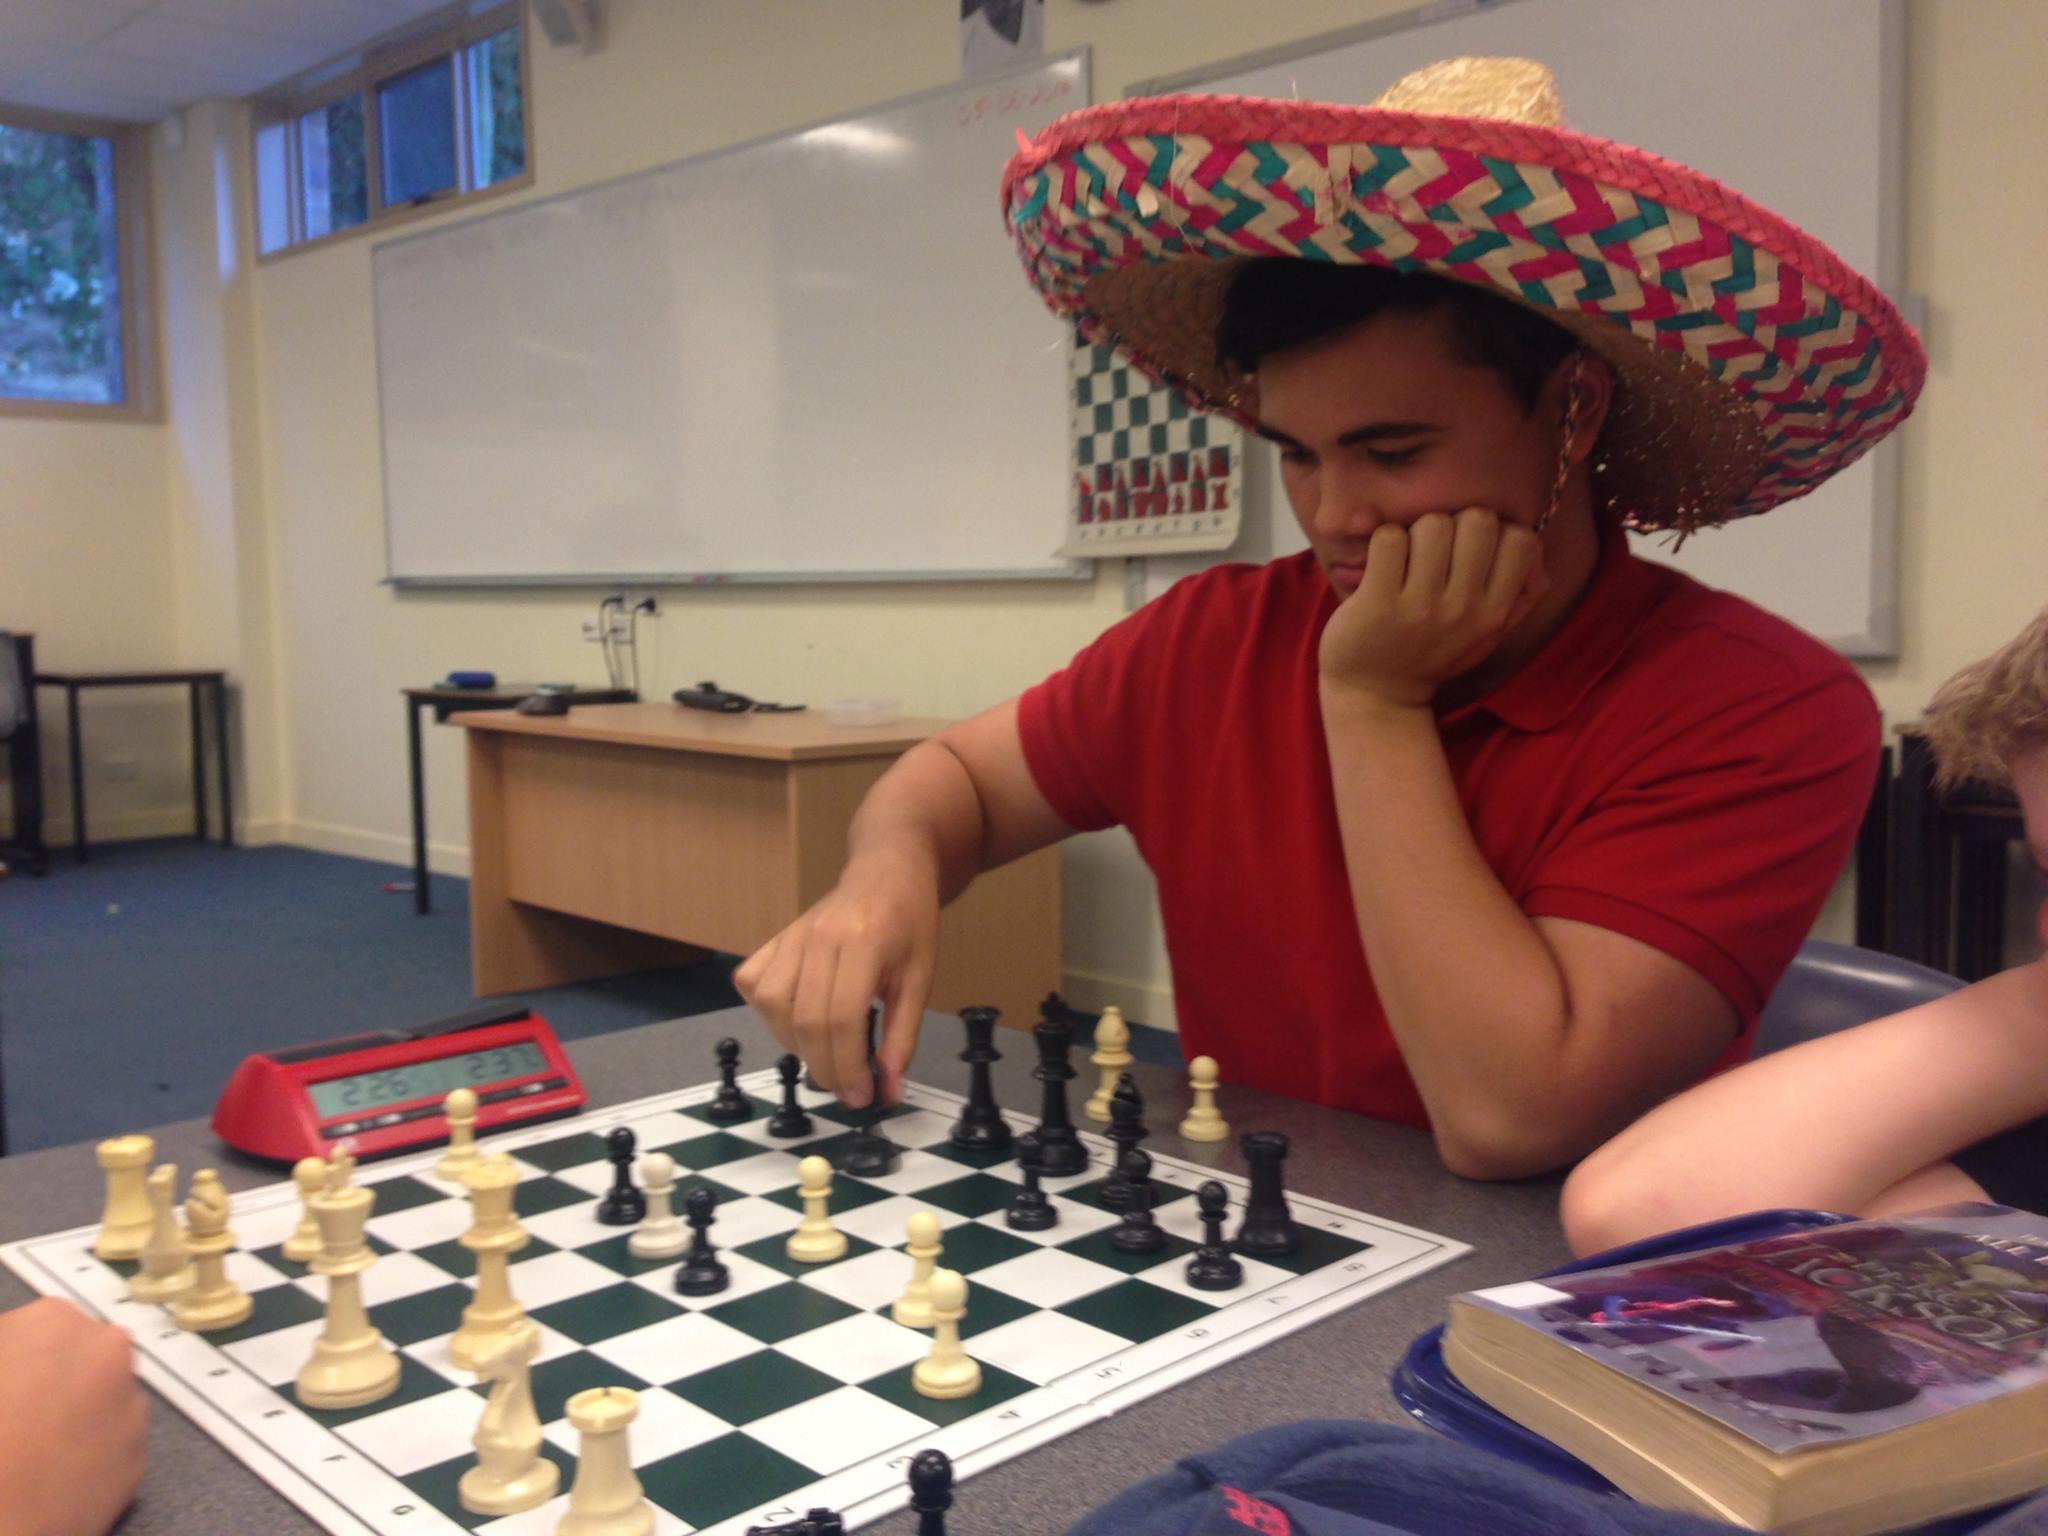 Alex has his thinking cap on!